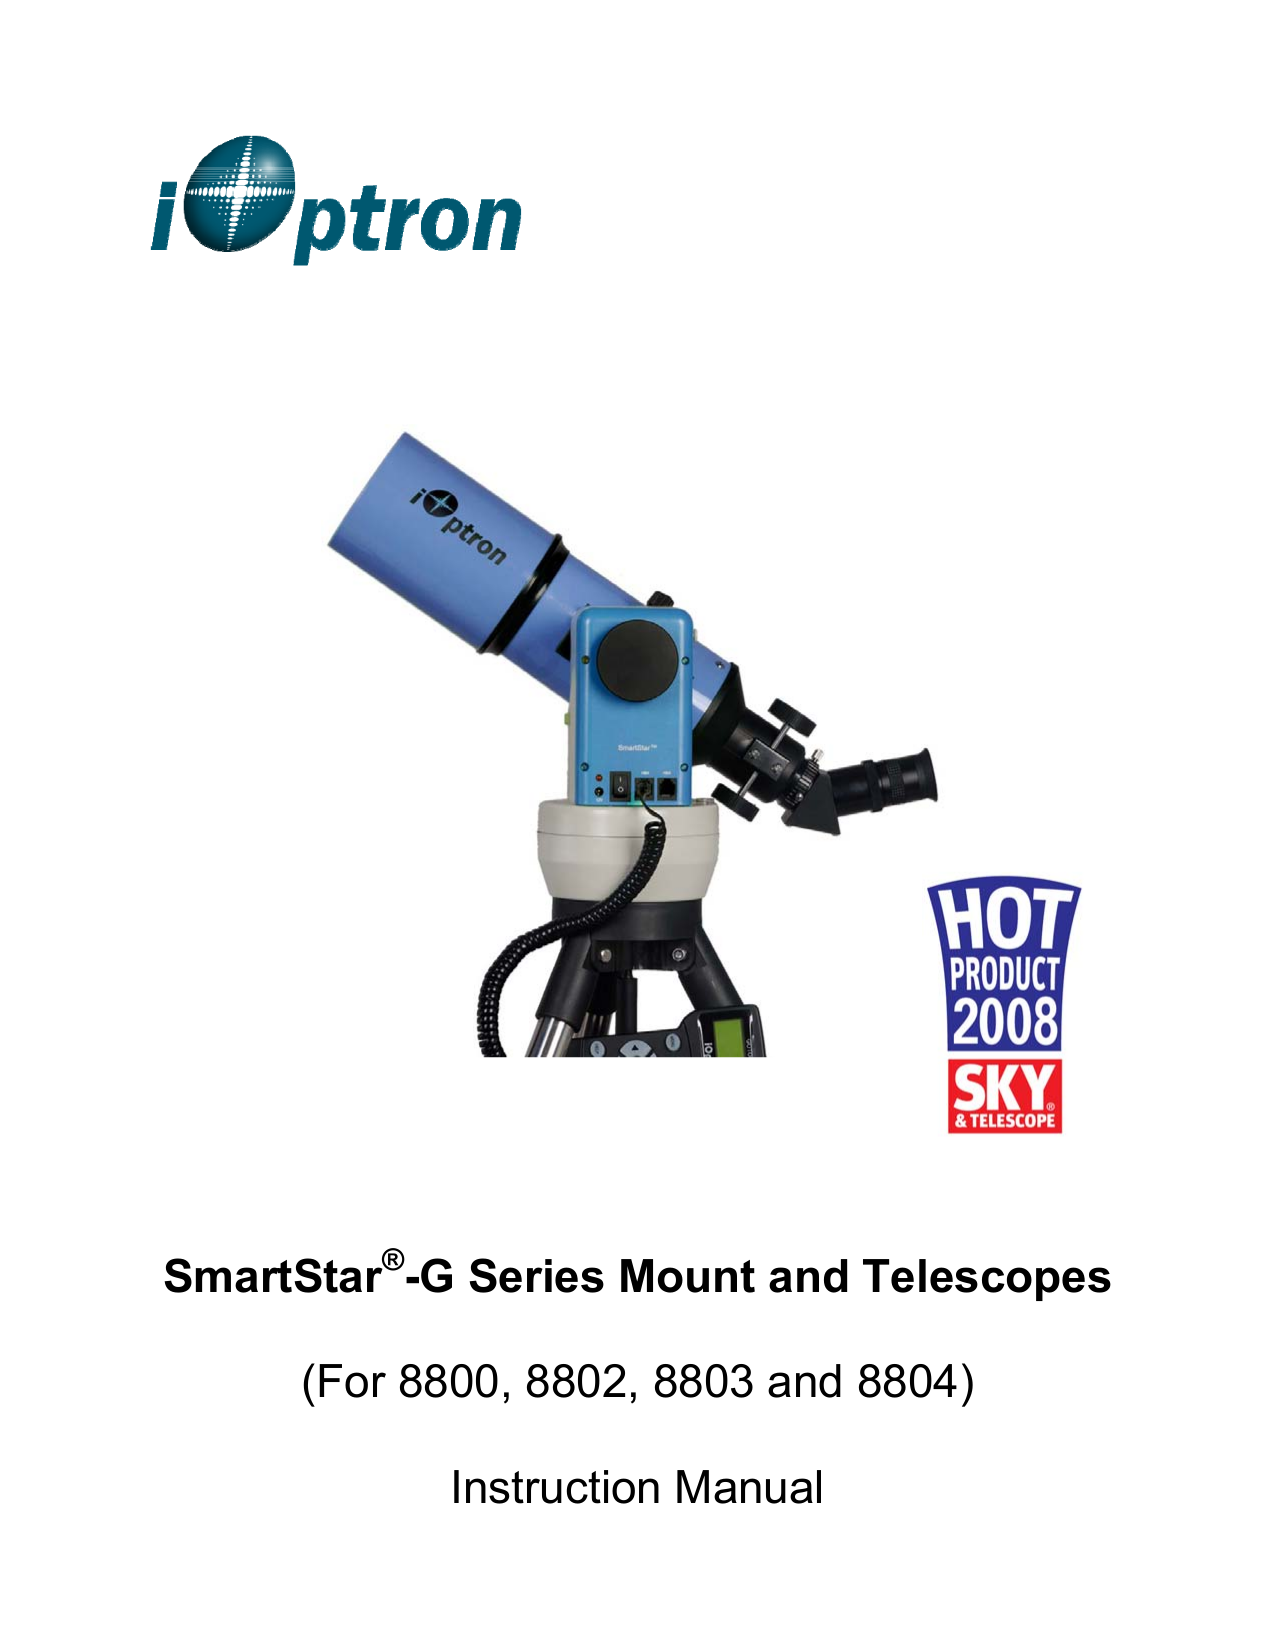 pdf for Ioptron Telescope SmartStar G-N114 manual